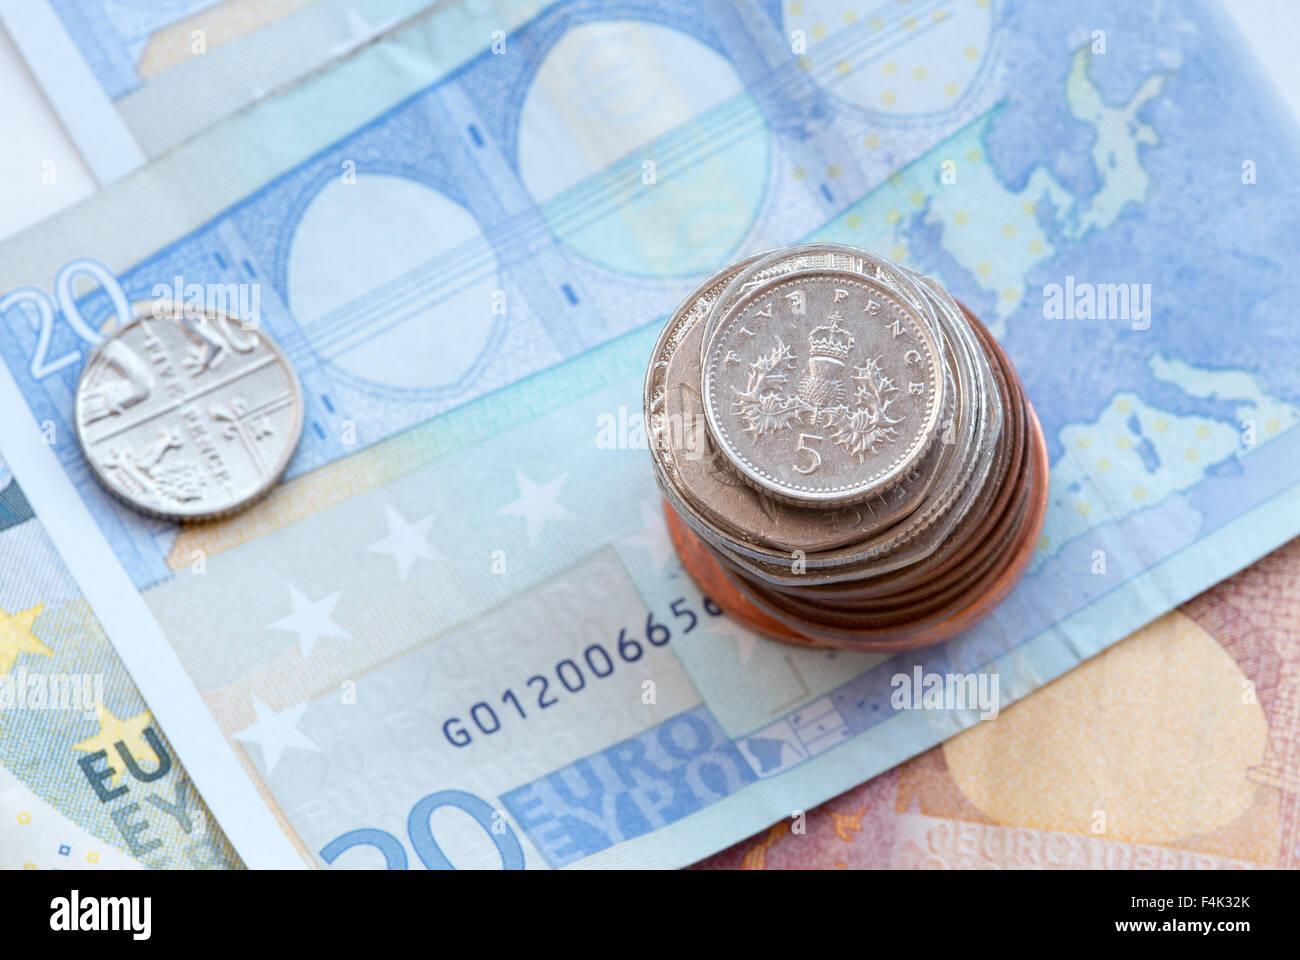 Cinco de plata británica pence coin sobre un montón de monedas y billetes de Euro 20 Foto de stock